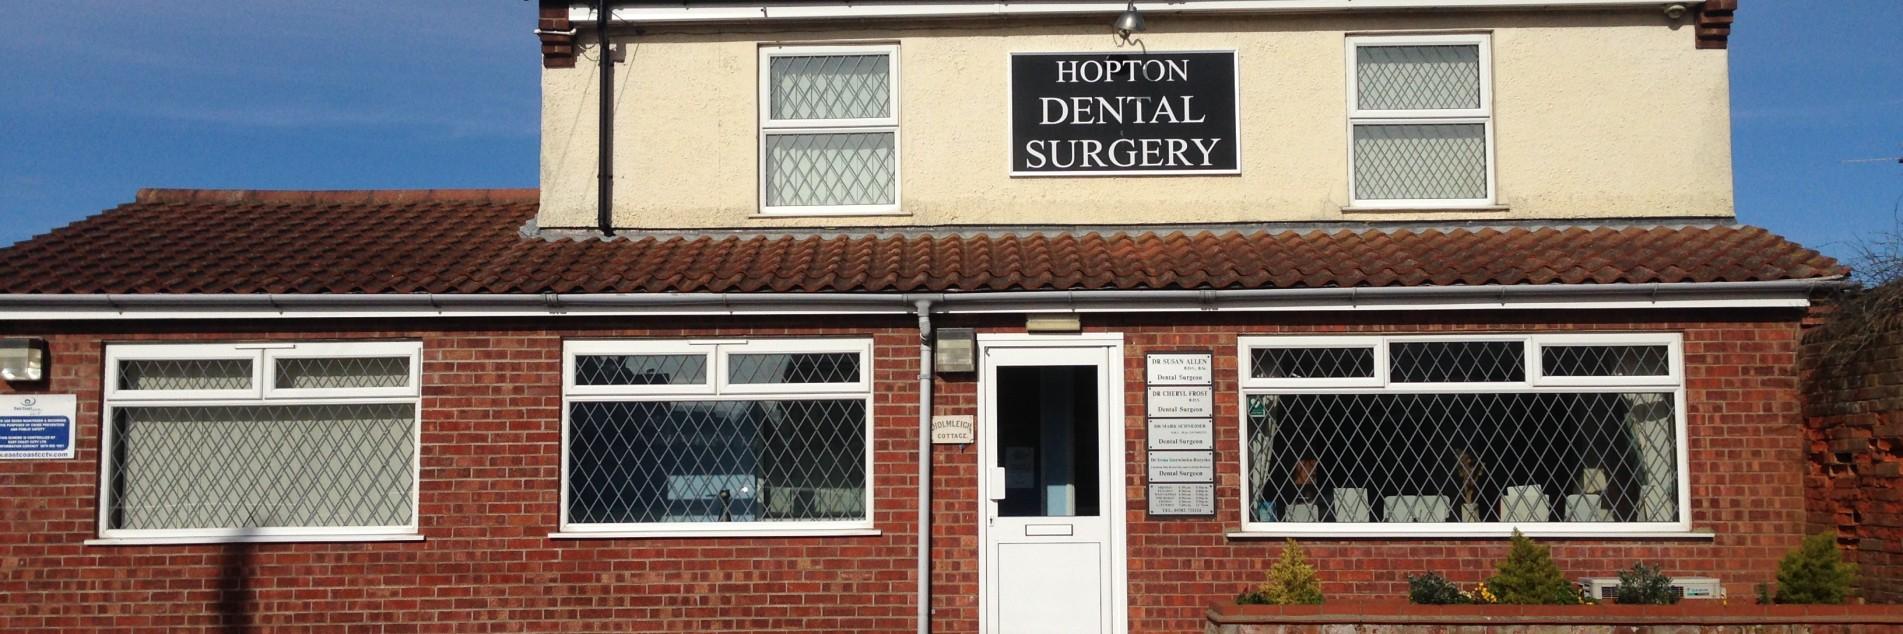 Hopton Dental Surgery